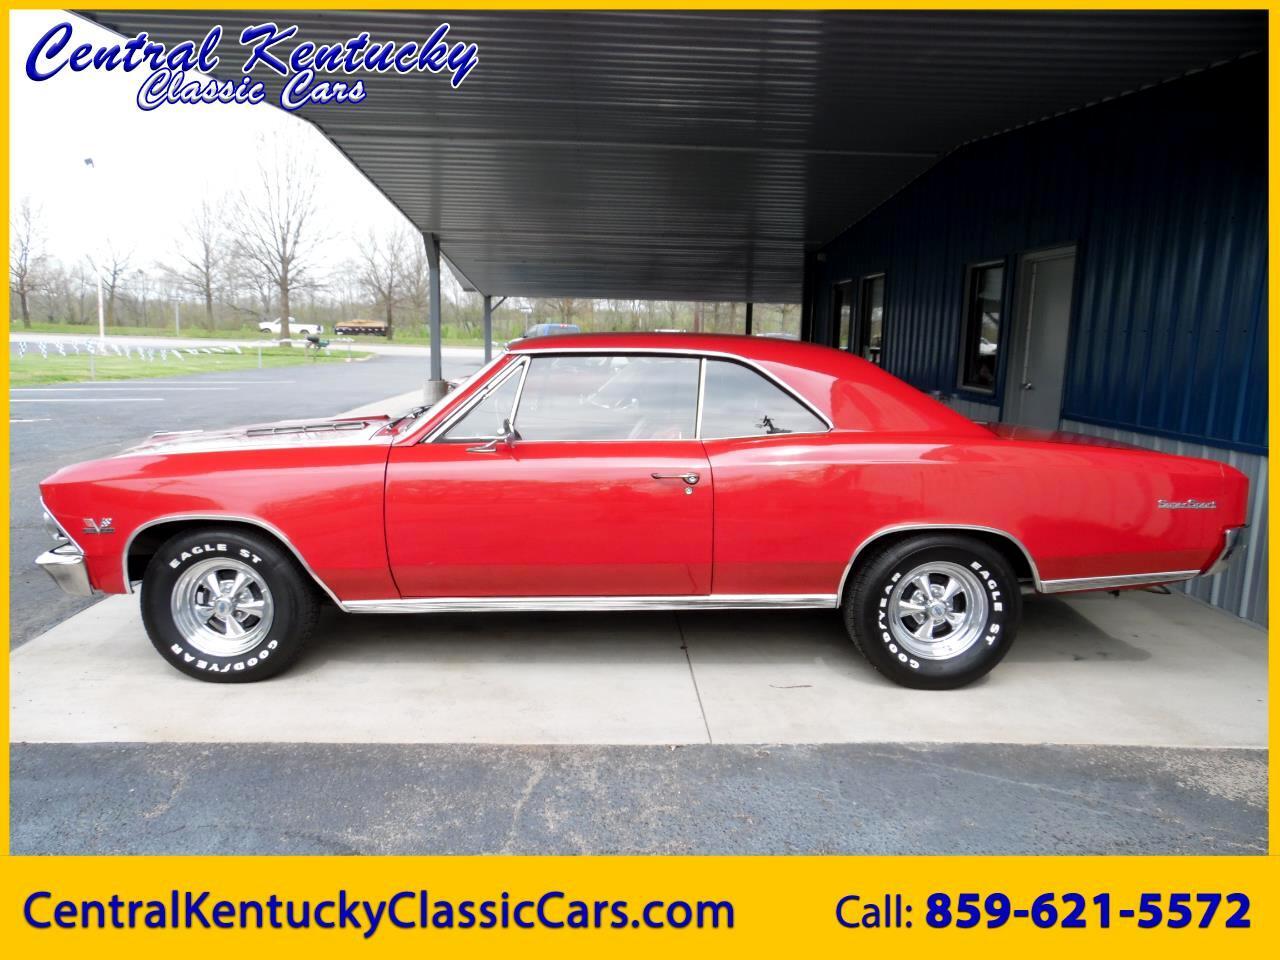 Used Cars Paris KY | Used Cars & Trucks KY | Central Kentucky